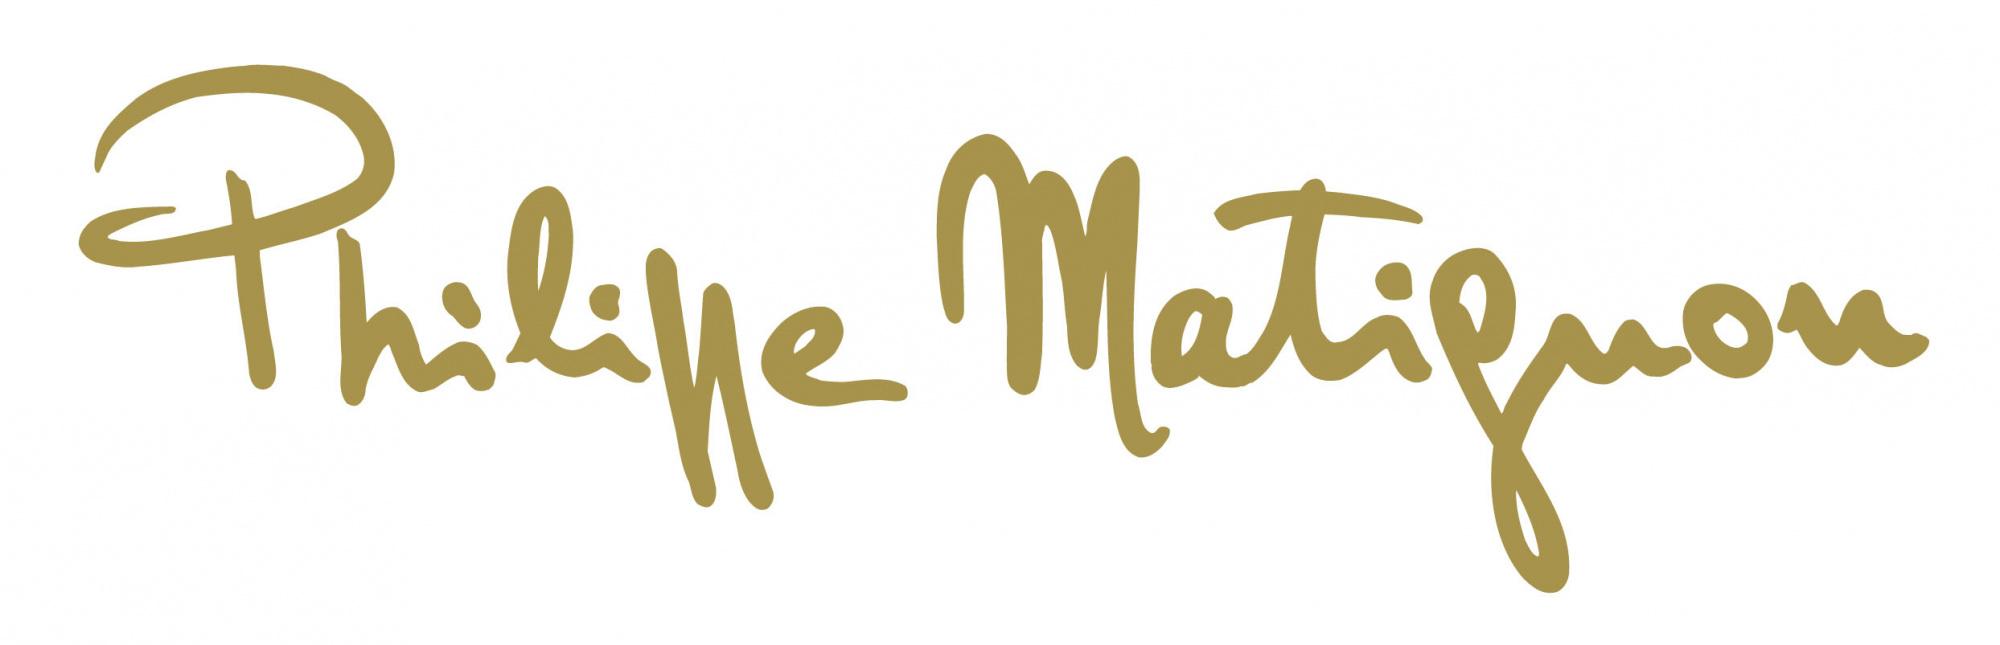 Торговая марка PHILIPPE MATIGNON оптом по цене производителя